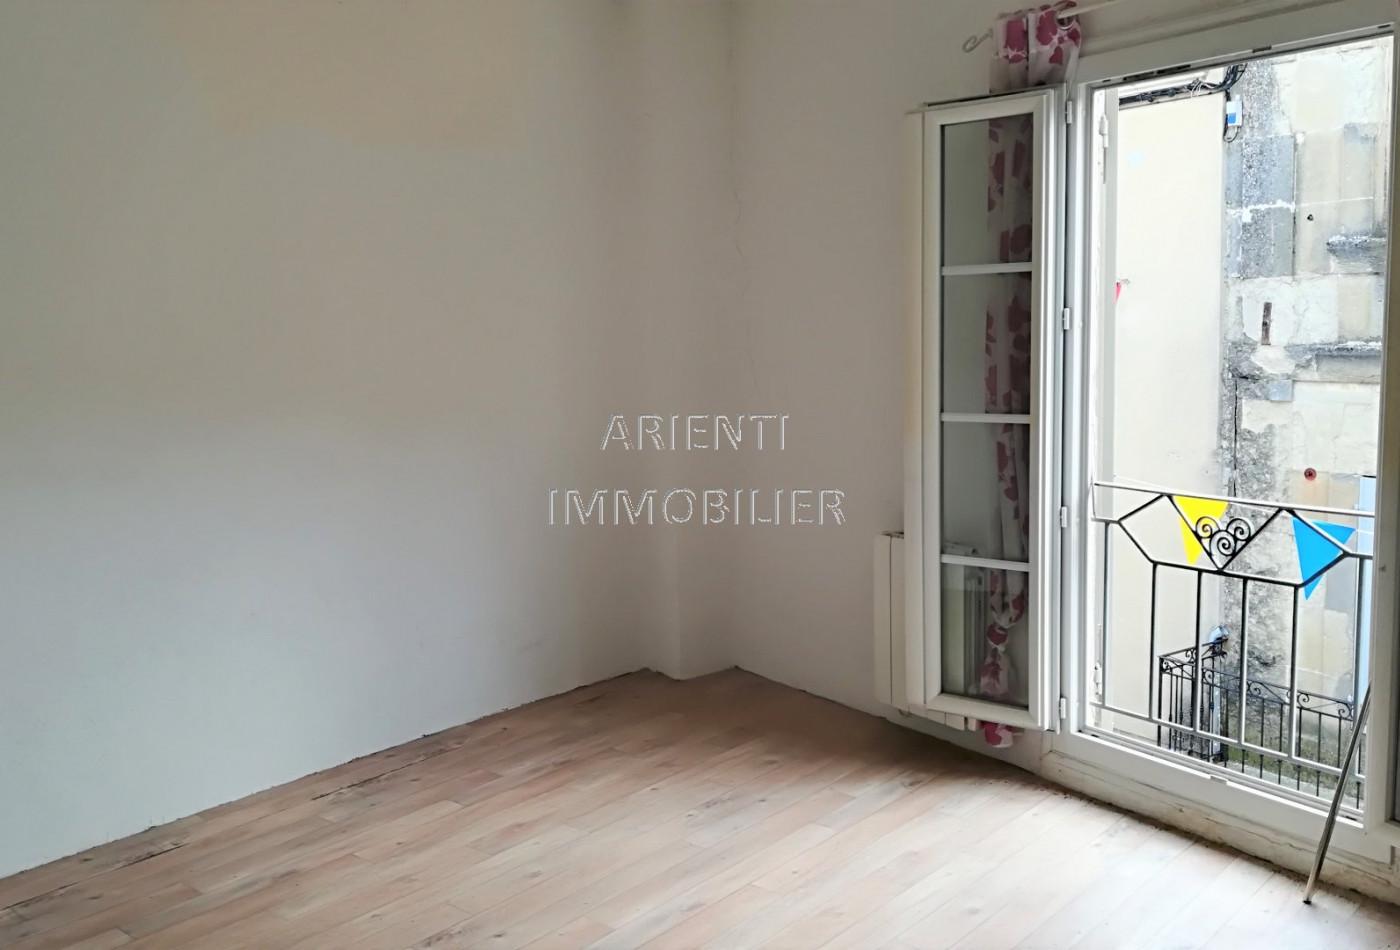 A vendre  Valreas   Réf 260013206 - Office immobilier arienti